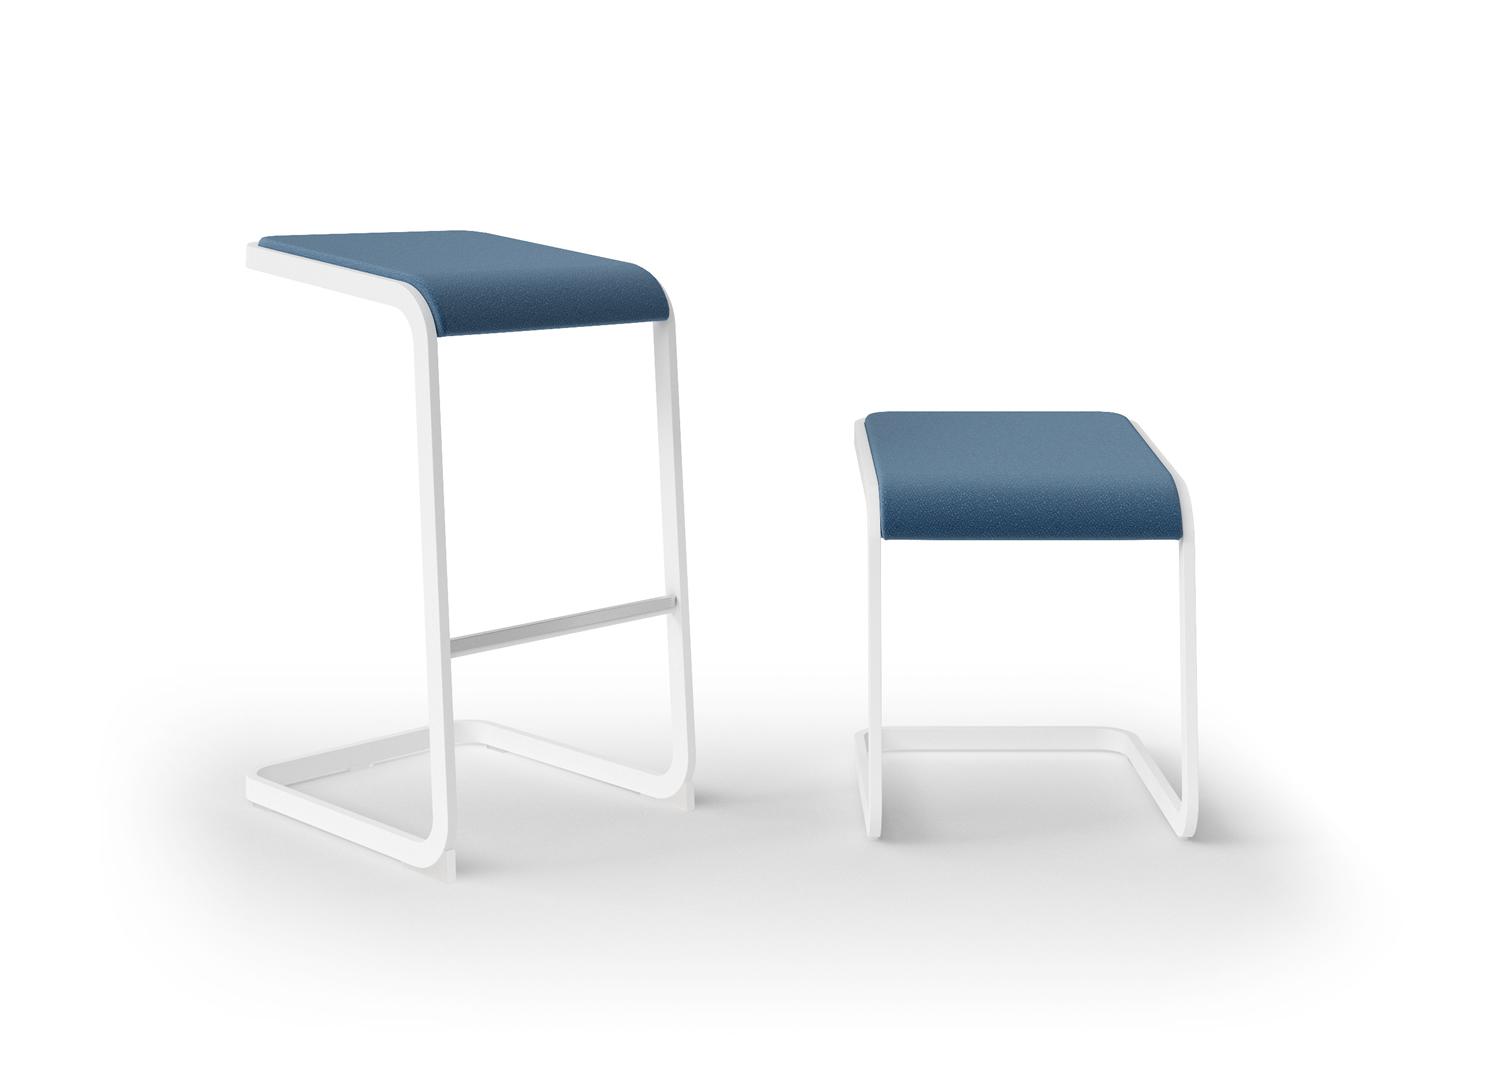 Quadrifoglio Sedie Ufficio : C stool una rivoluzionaria seduta d ufficio design diffusion